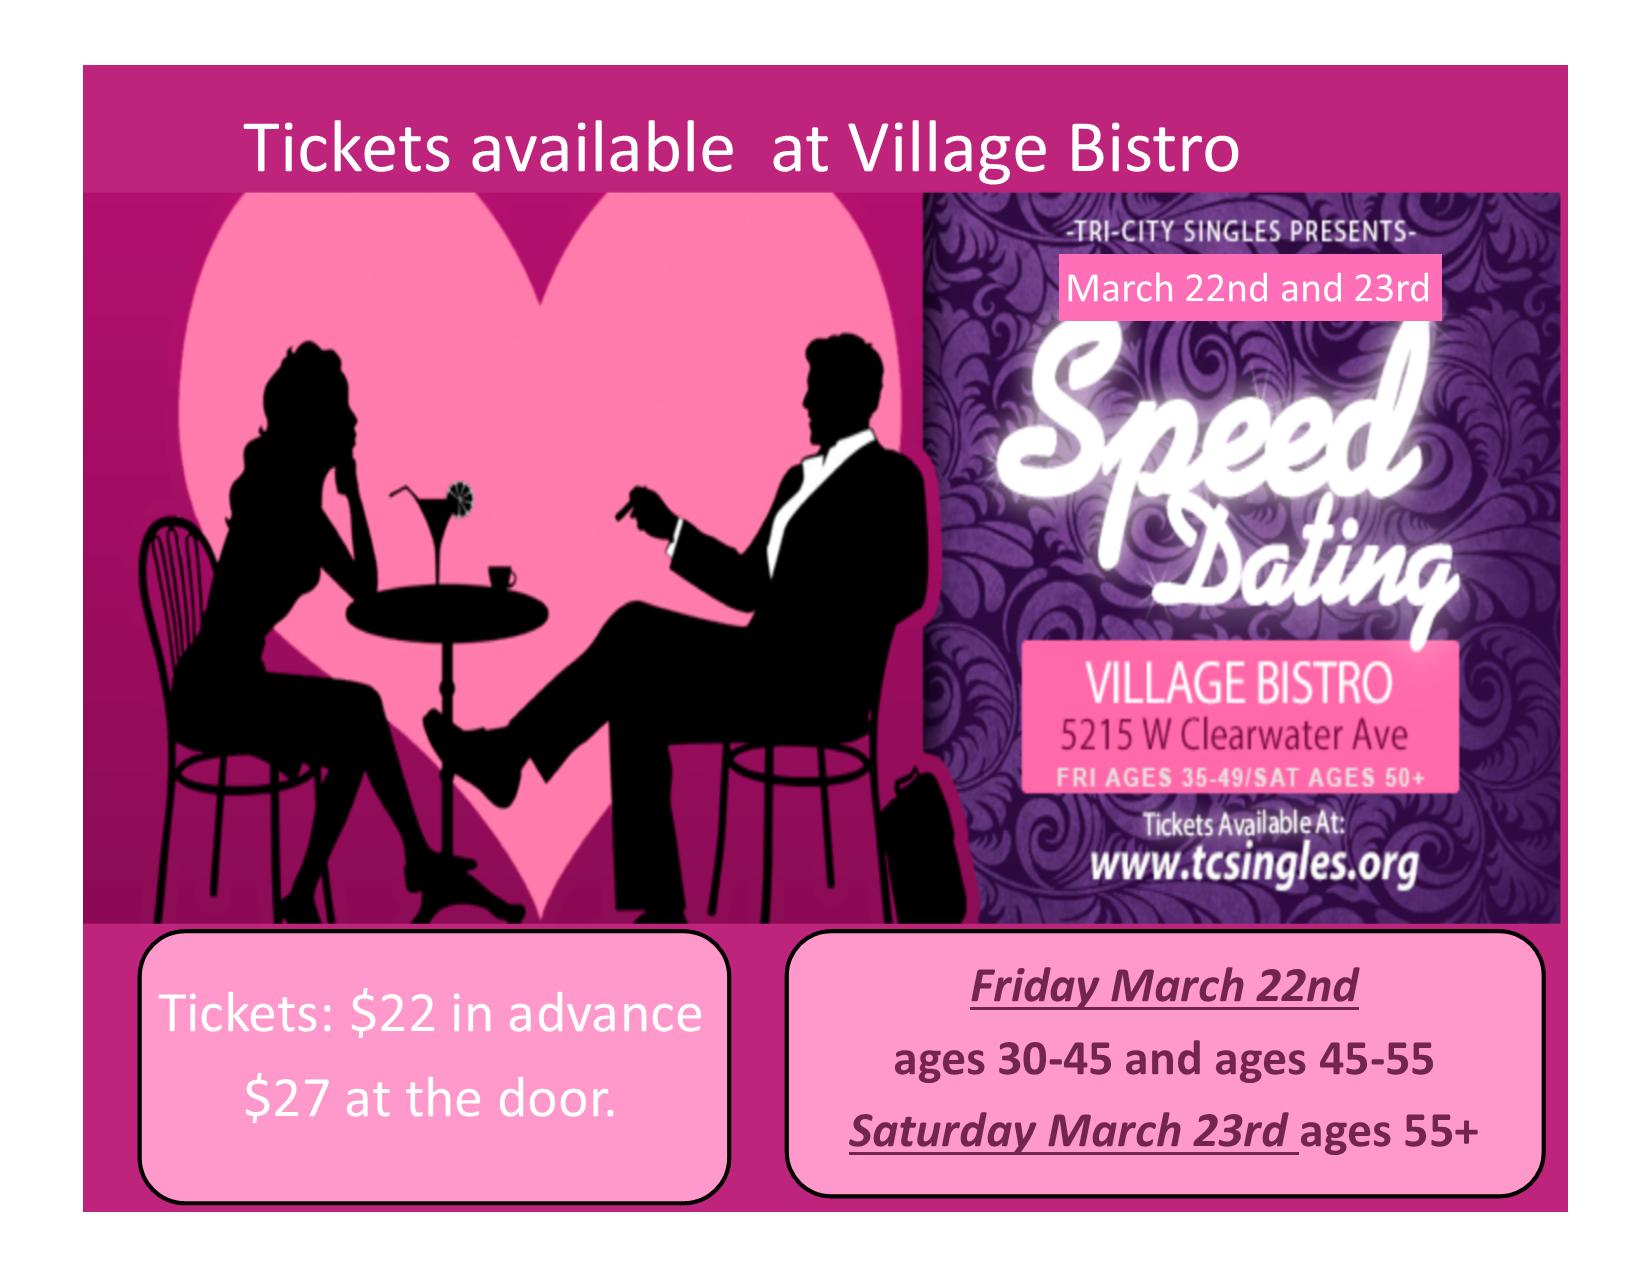 village drinks speed dating